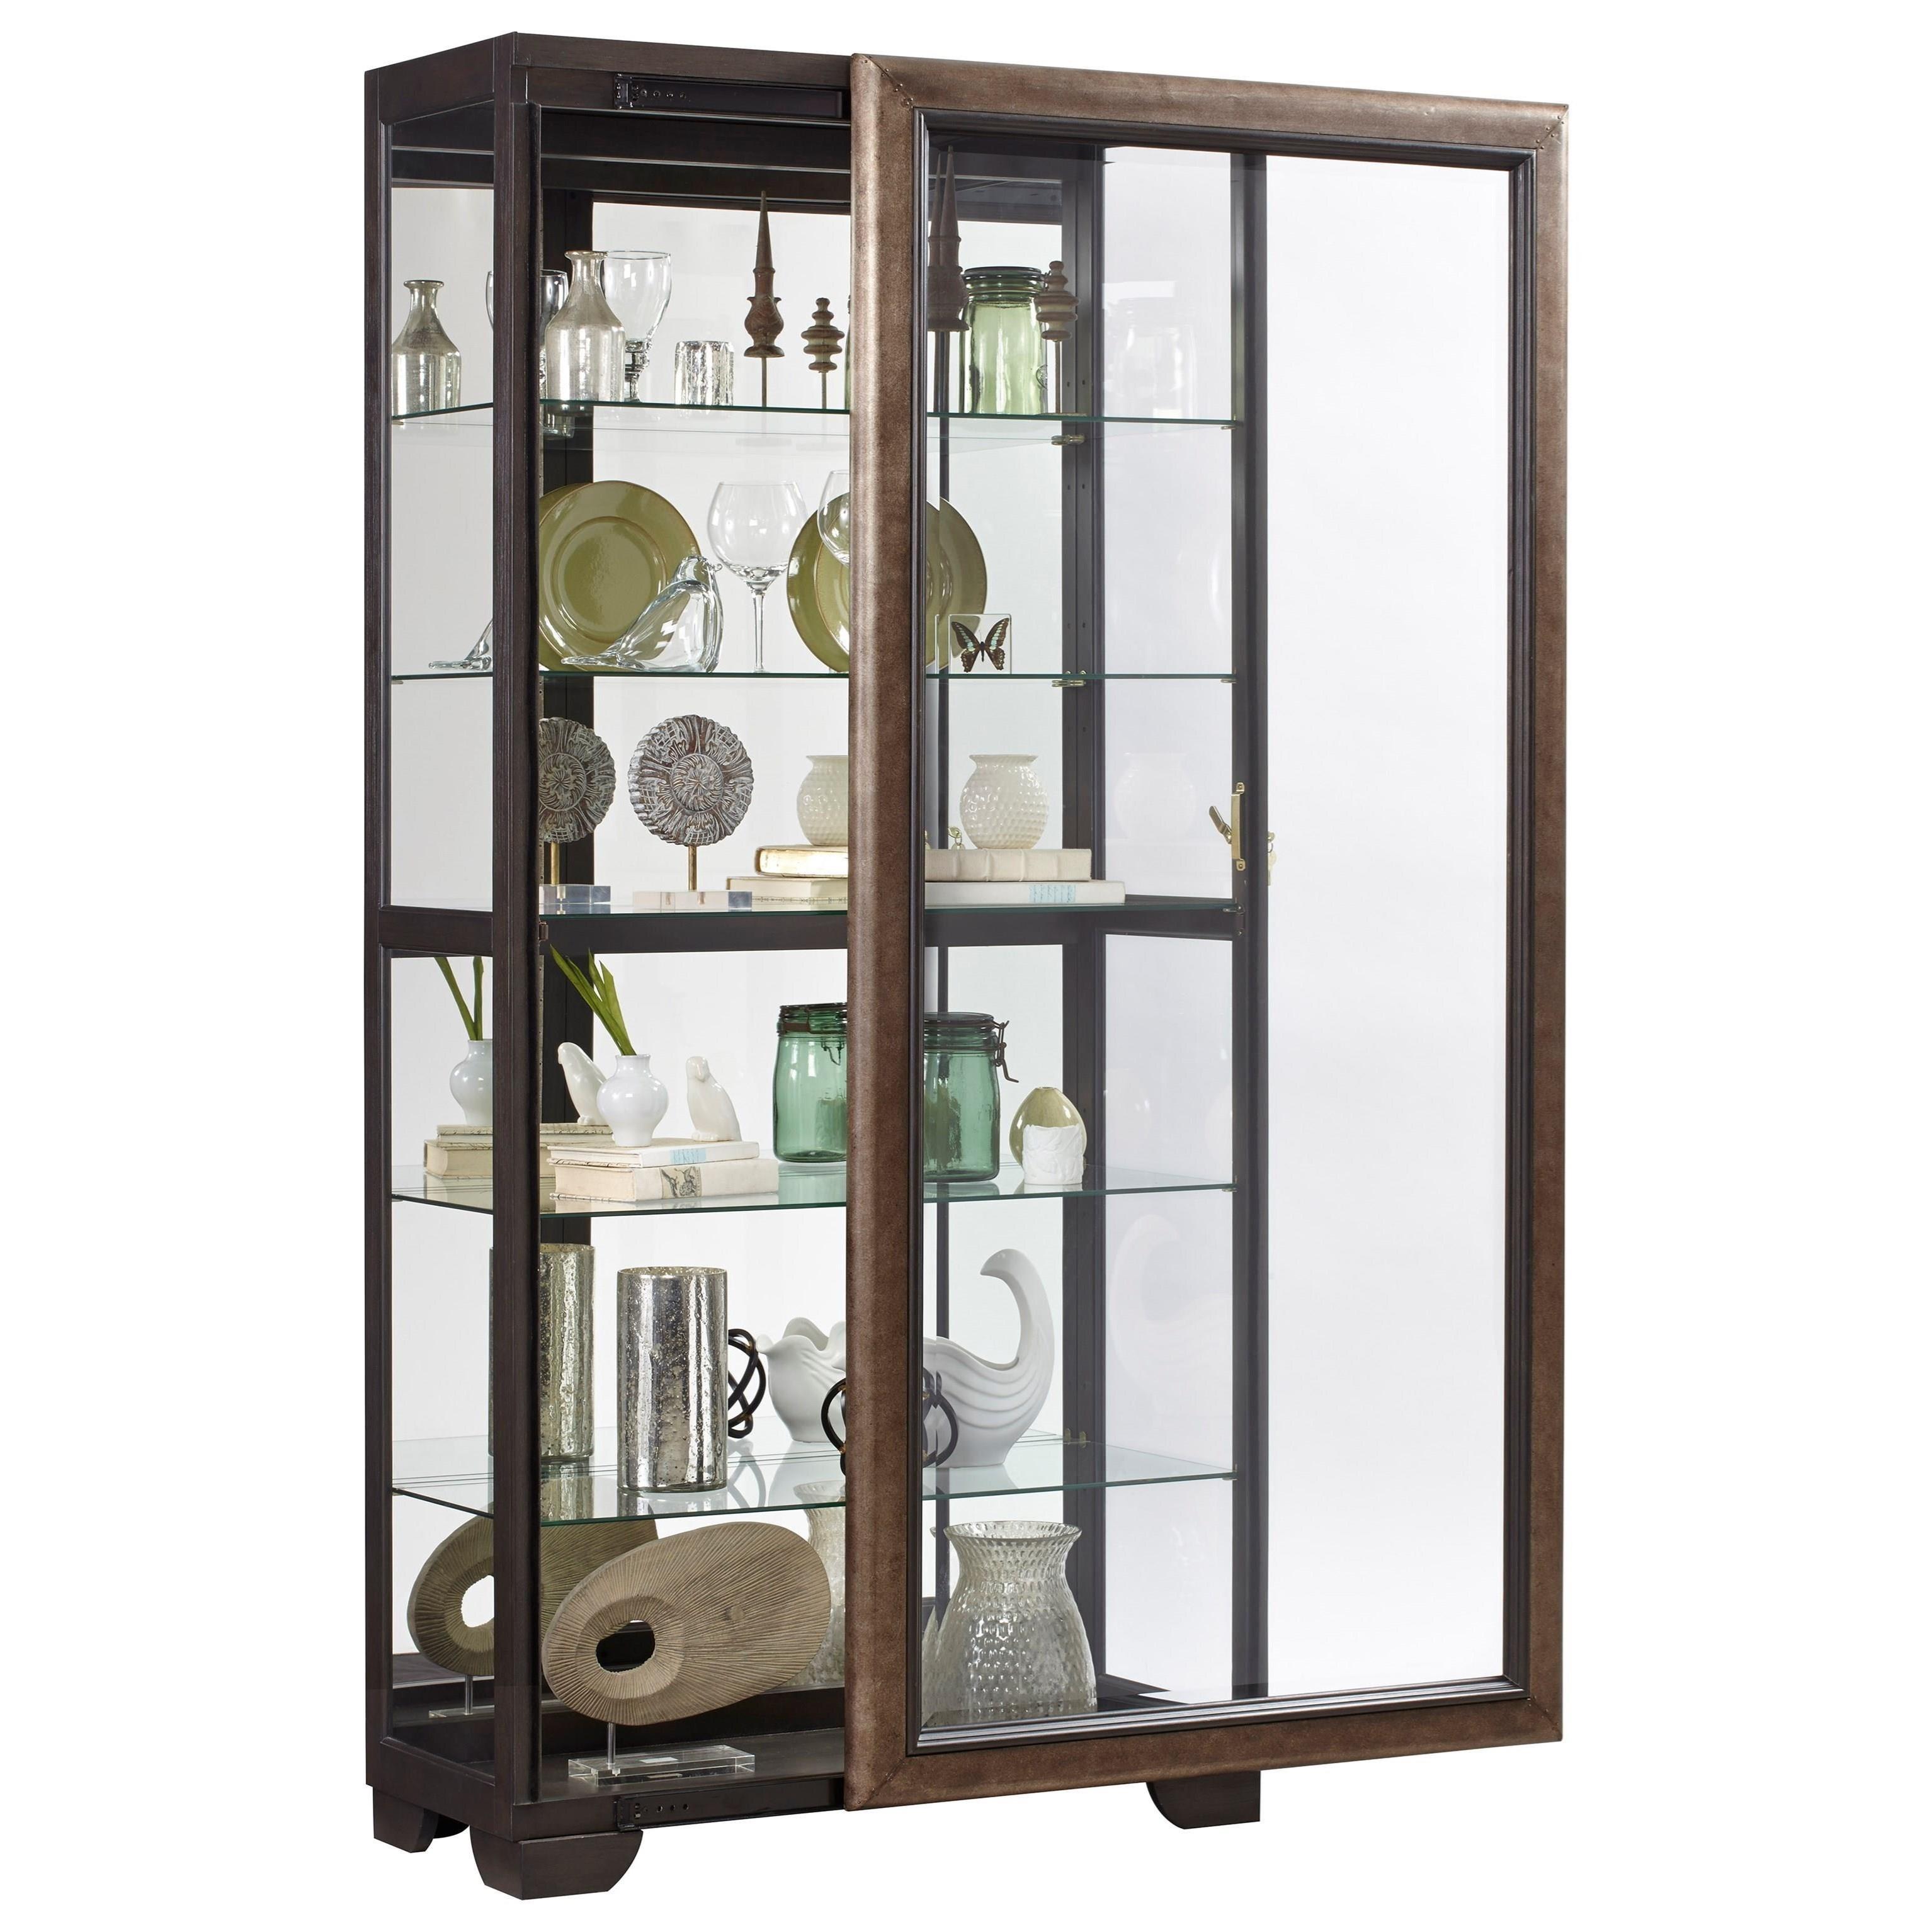 Pulaski Furniture Store: Pulaski Furniture Curios P021652 Sliding Front Curio With